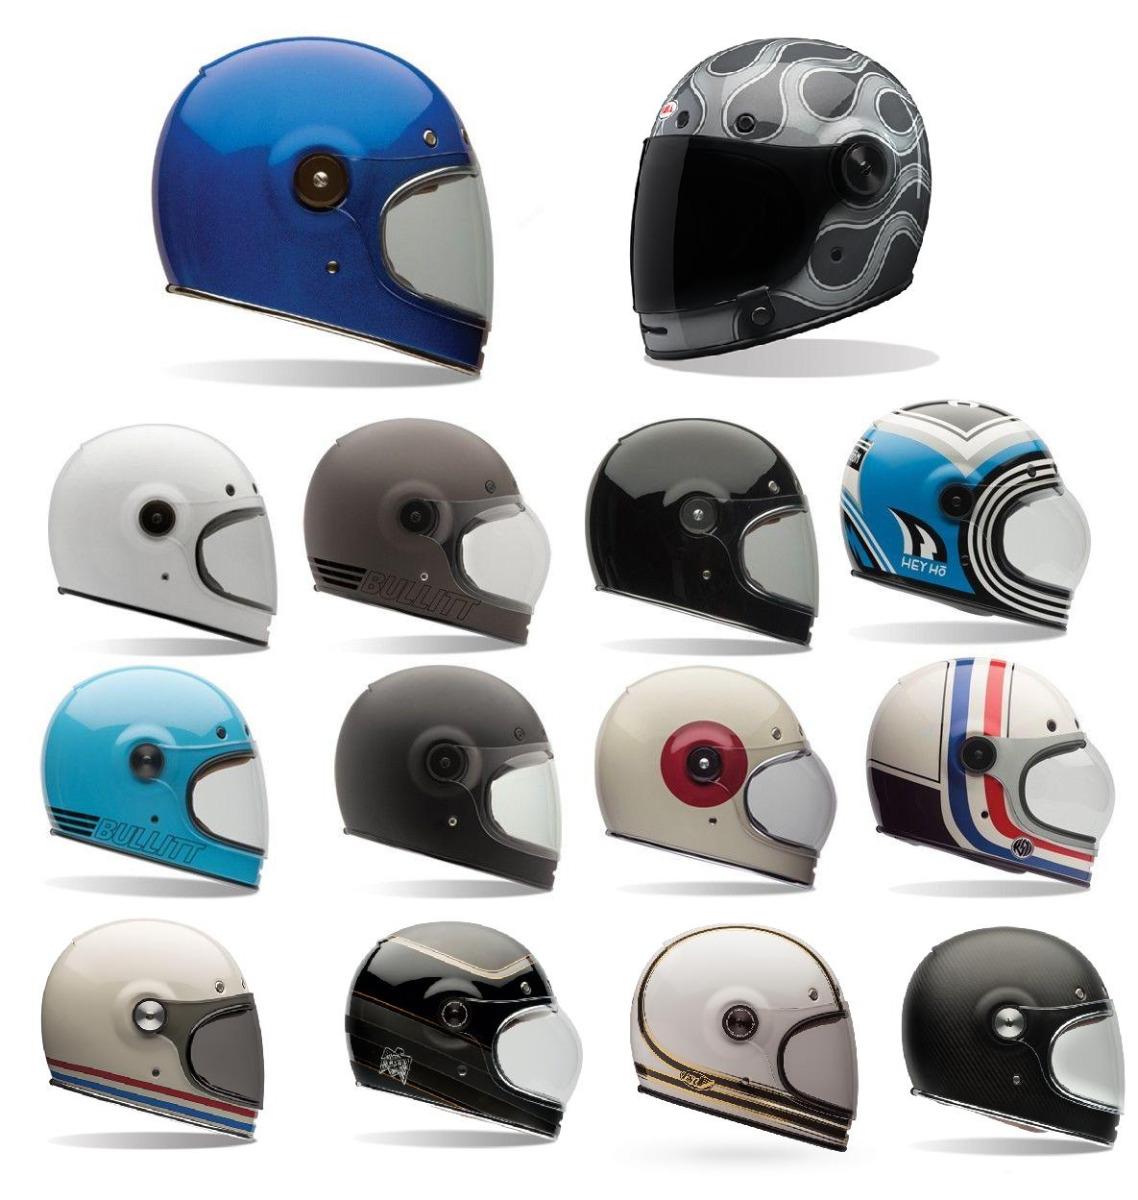 FAST SHIPPING* Bell Bullitt Retro Motorcycle Helmet ALL COLORS, ALL ...